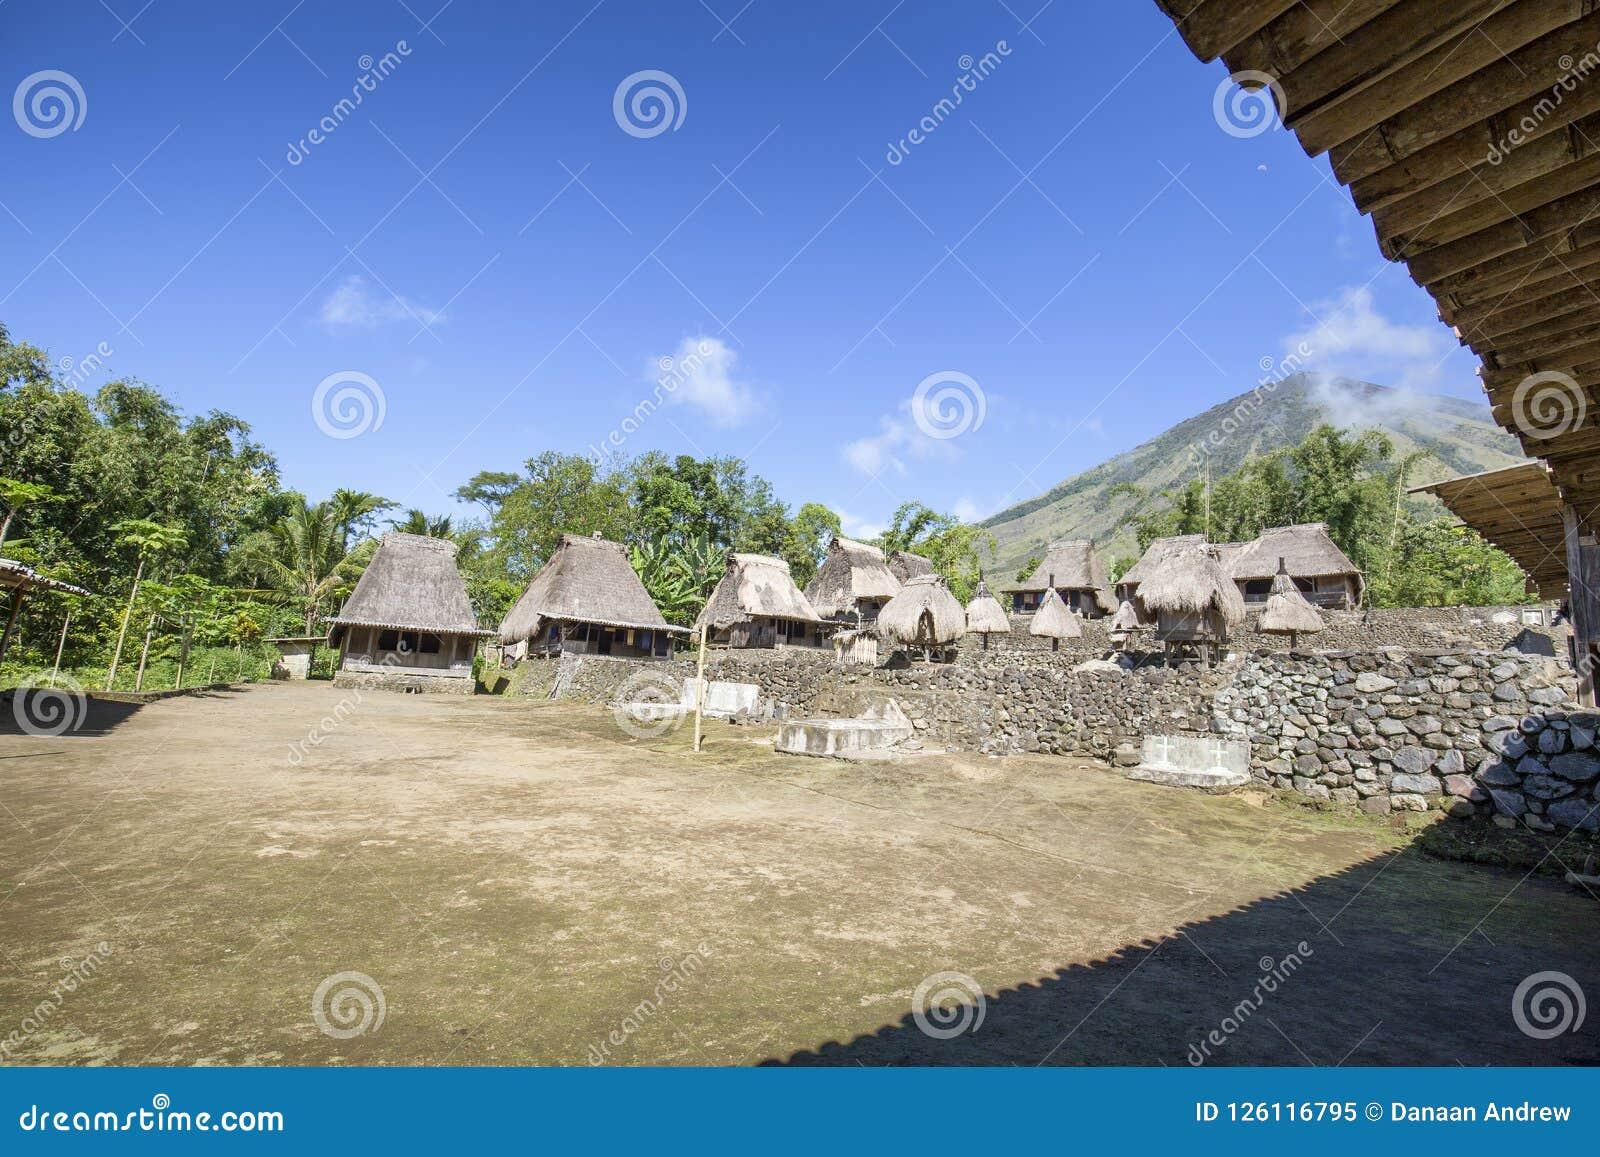 Traditional Flores Village Stock Image Image Of Bena